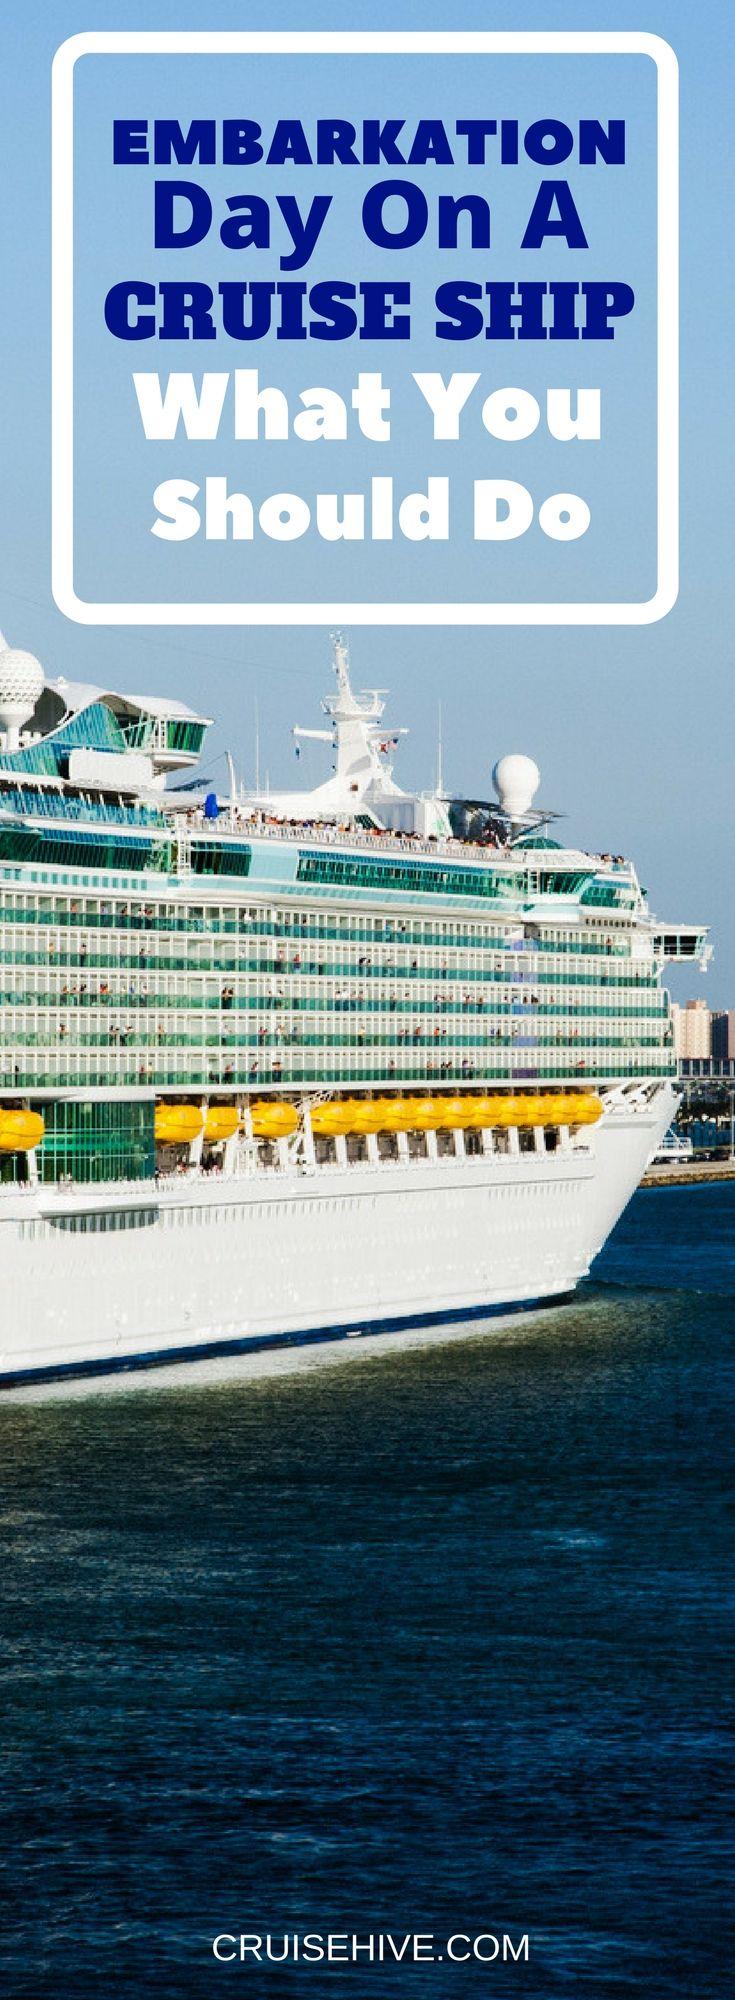 Best Cruise Wear Ideas On Pinterest Cruise Dress Cruise - Cruise ship jumper